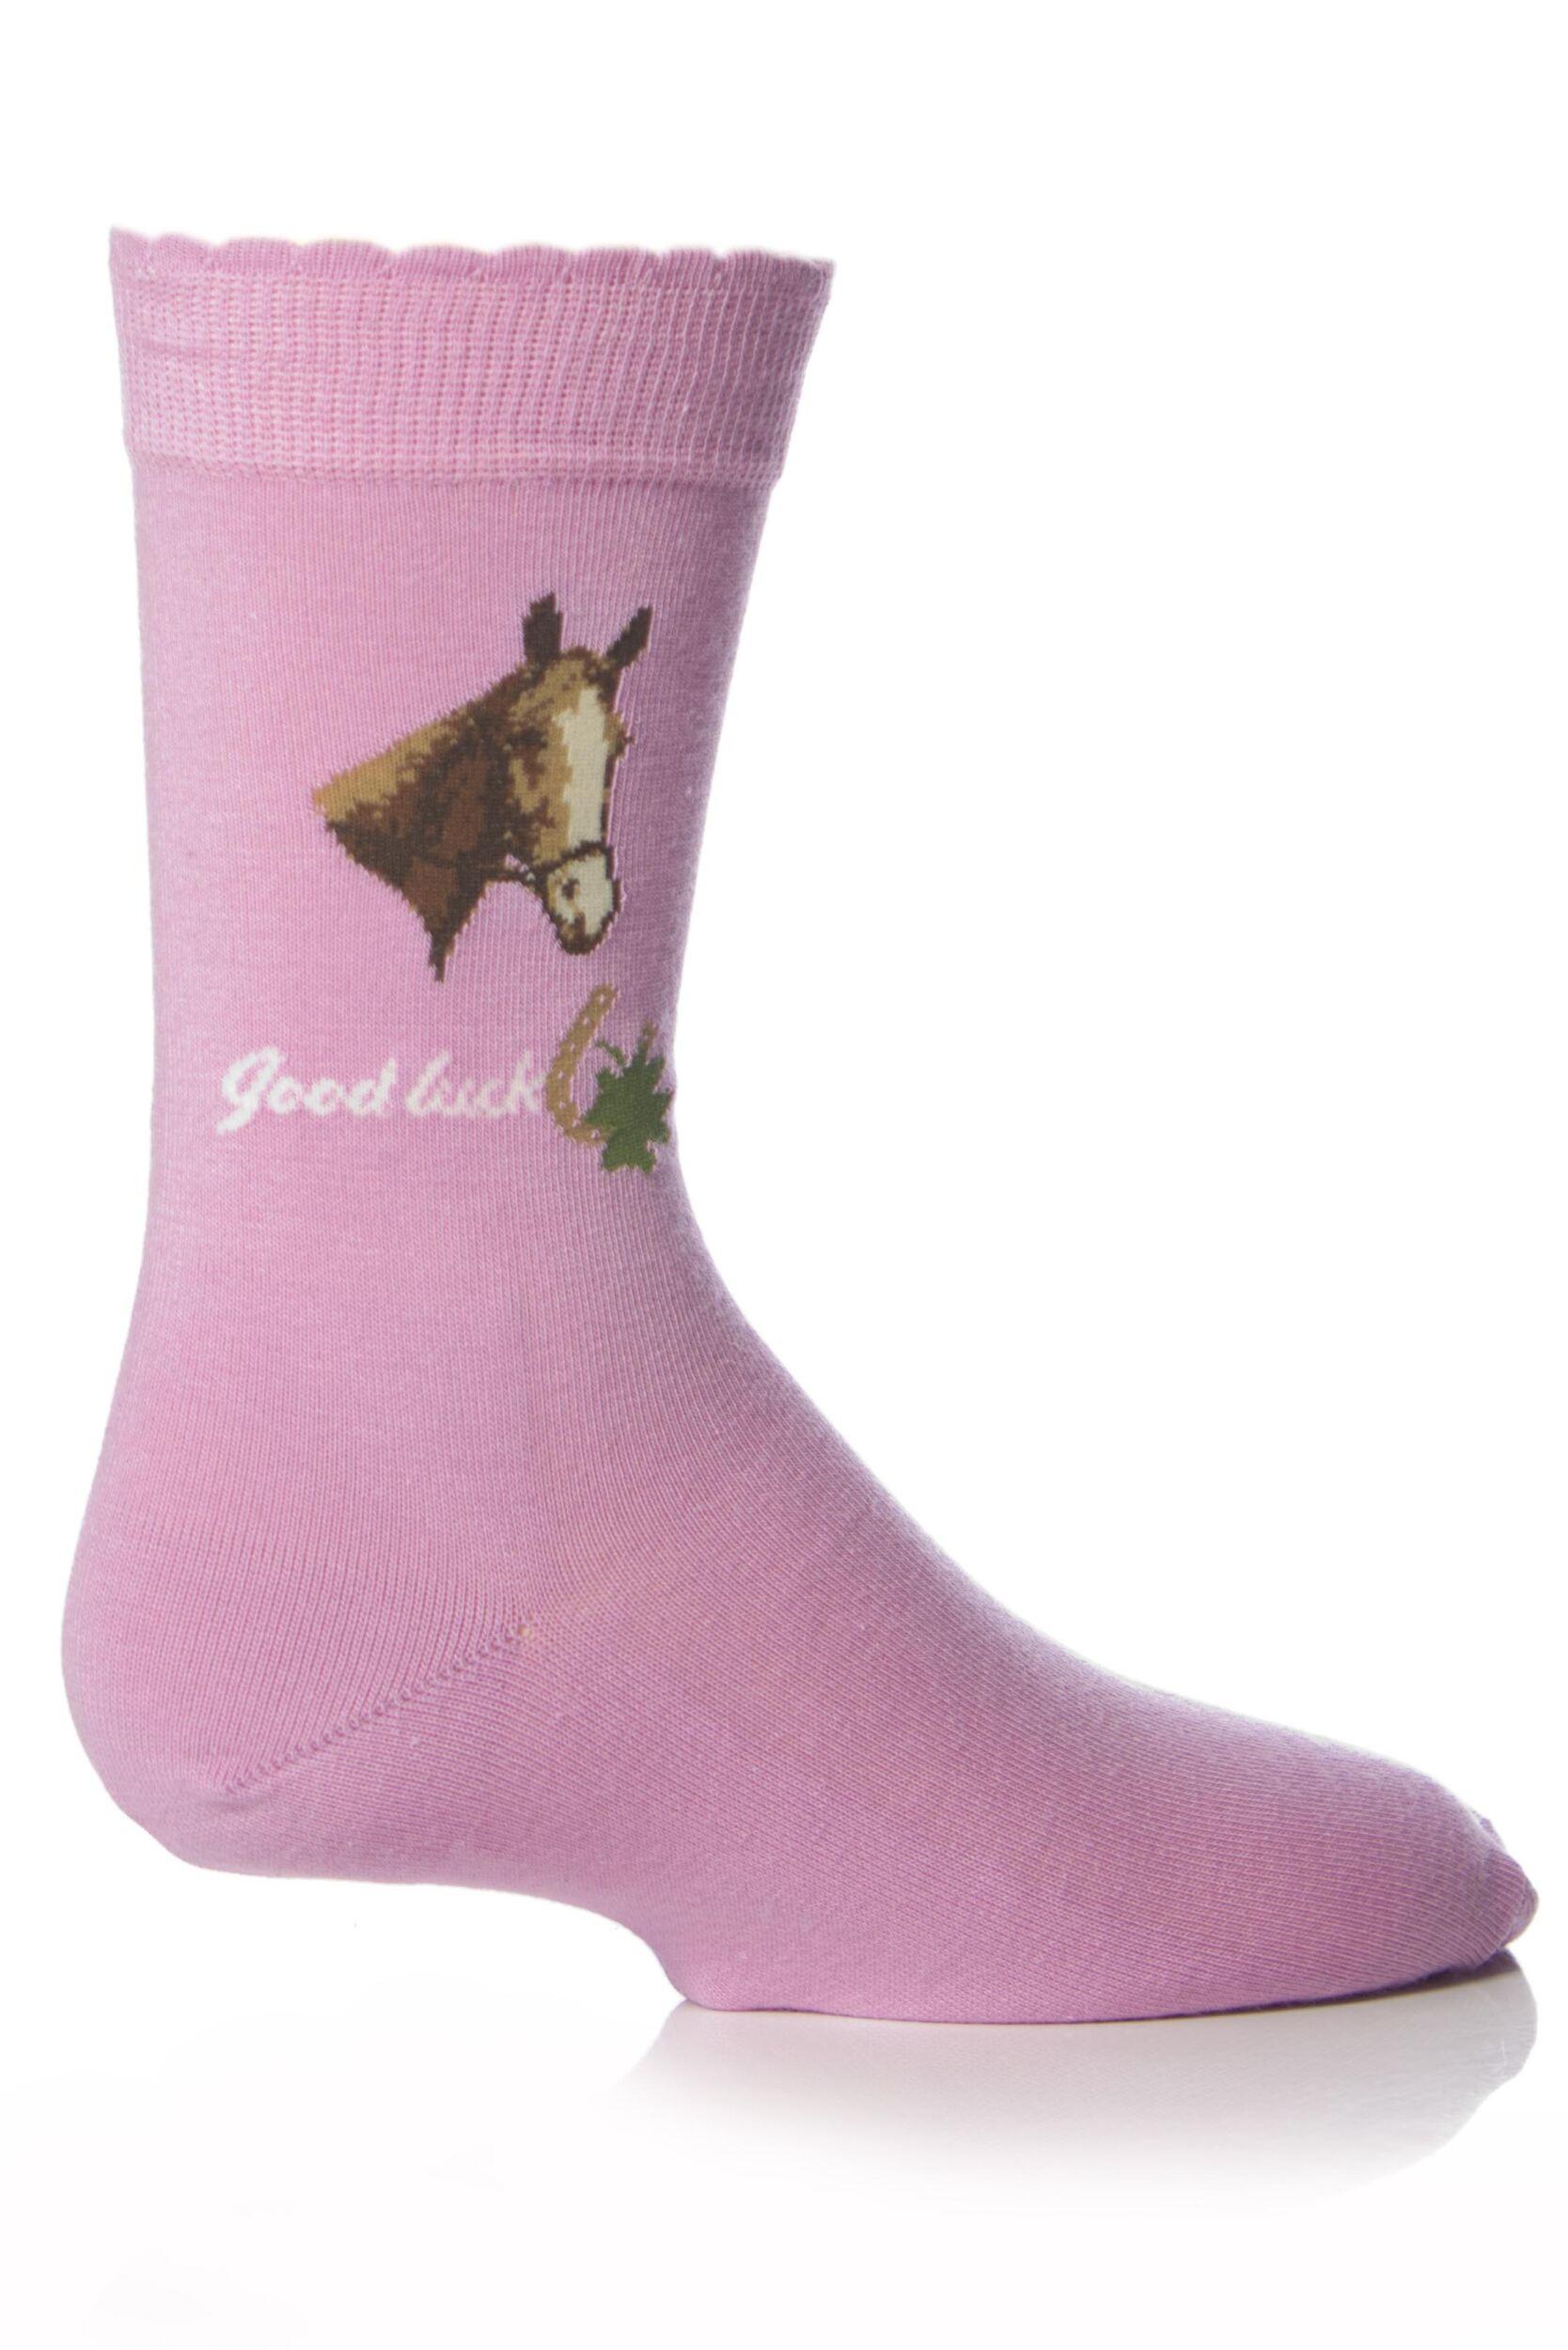 Image of Babies 1 Pair Falke Cotton Elephant Socks